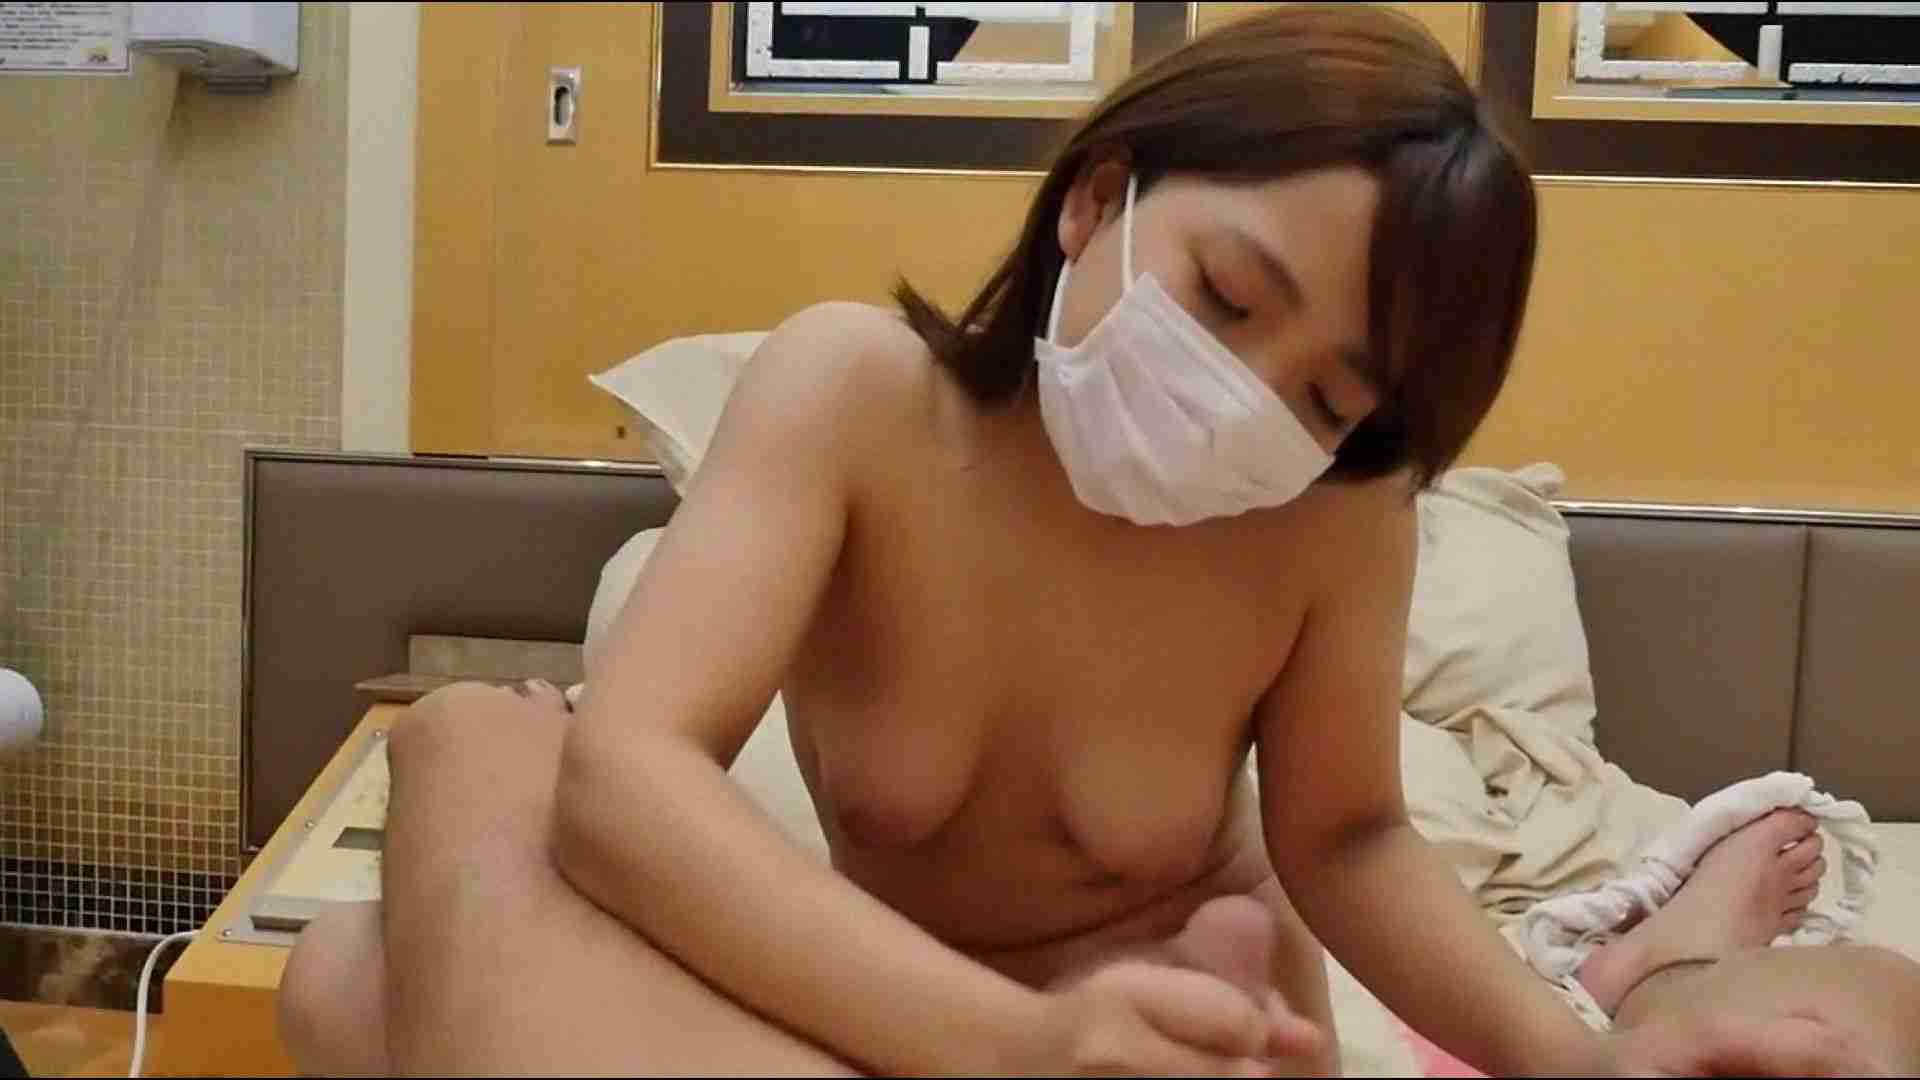 S級厳選美女ビッチガールVol.41 後編 0 | 0  74画像 23